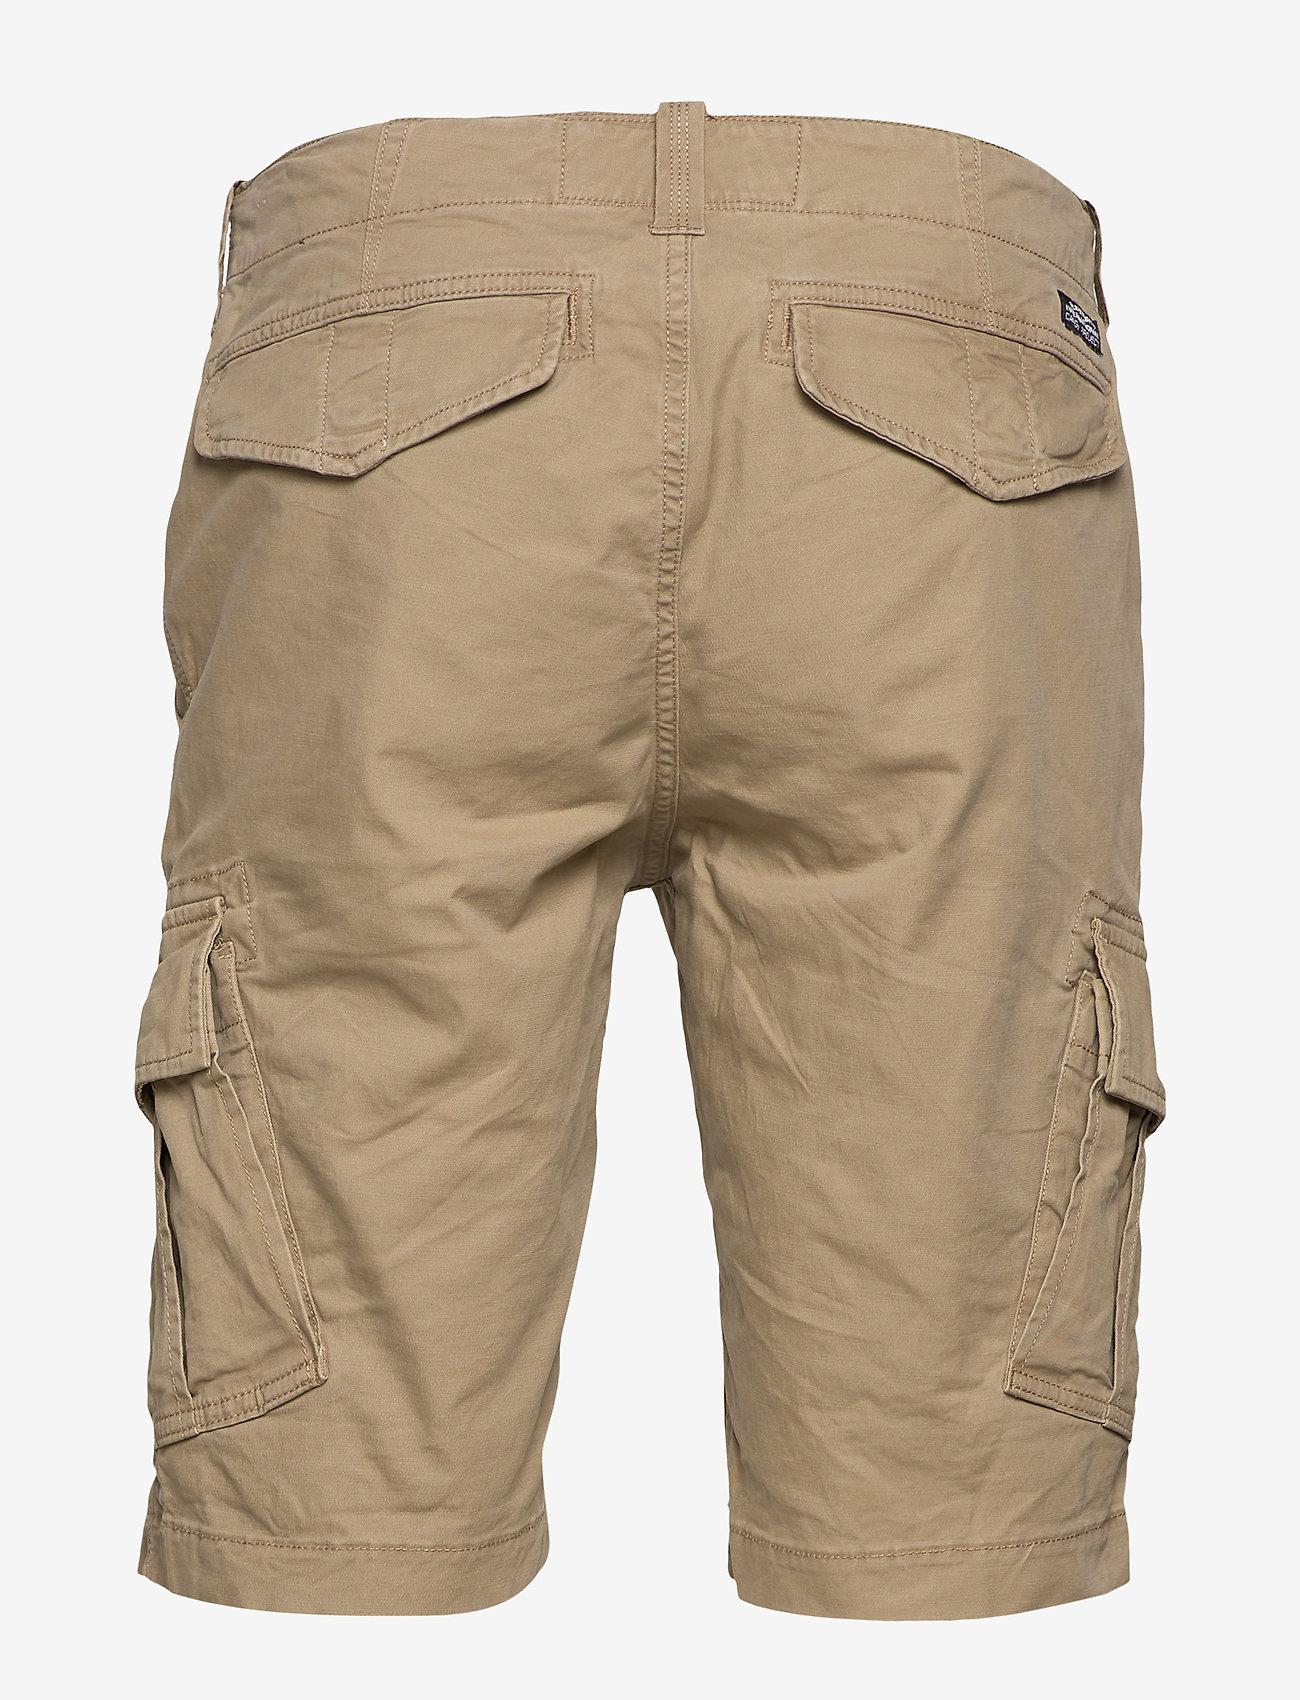 Superdry - CORE CARGO SHORTS - cargo shorts - dress beige